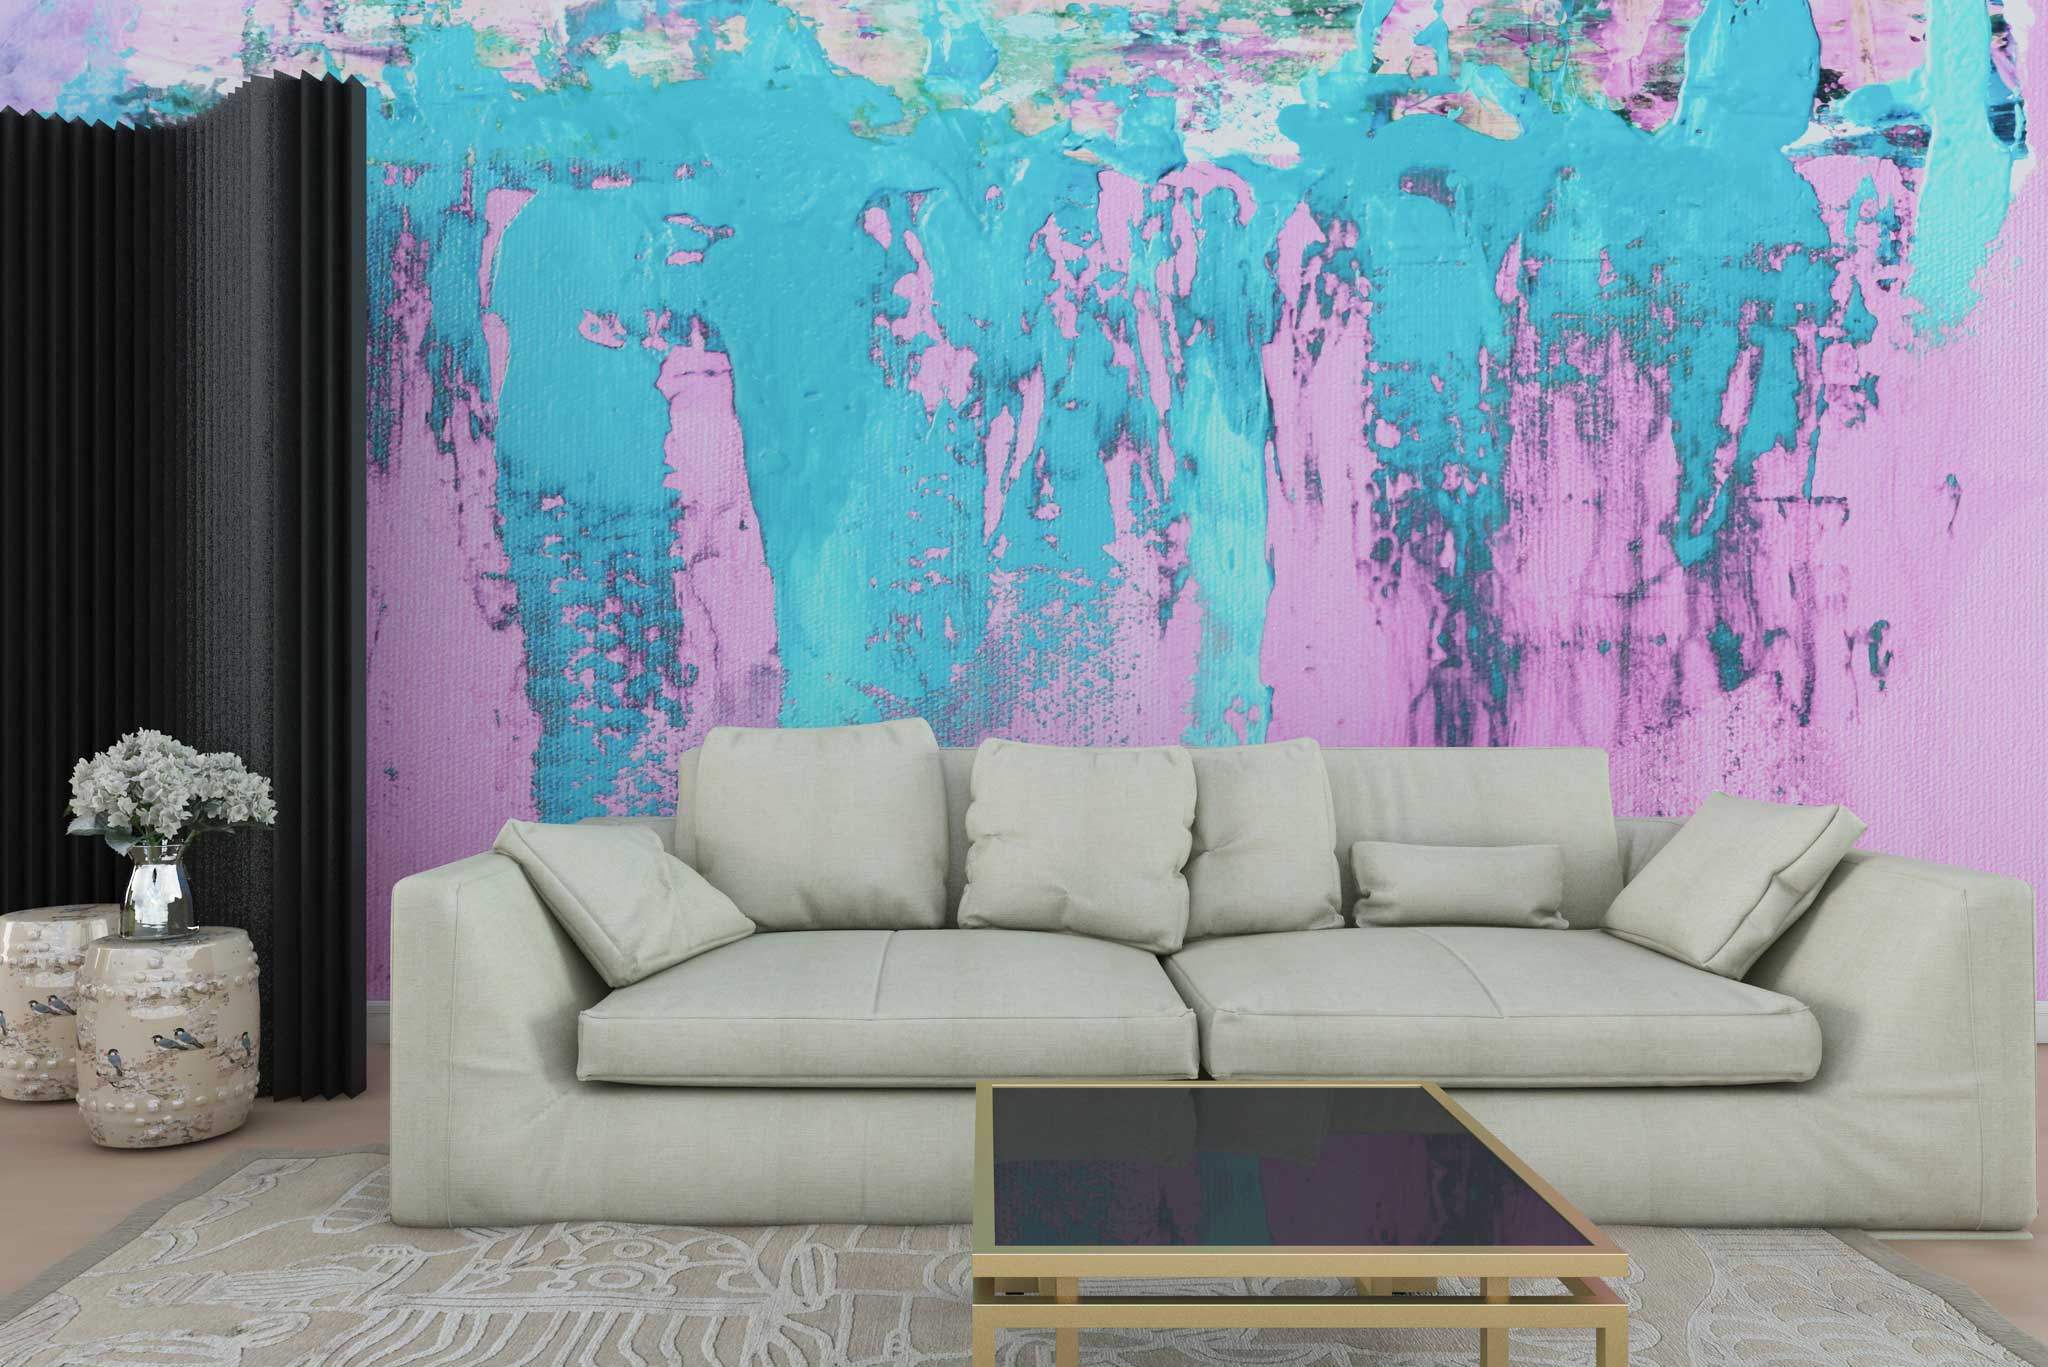 tapet-fototapet-personalizat-comanda-bucuresti-model-pictura-arta-abstracta-roz-turcoaz-perete-lux-special